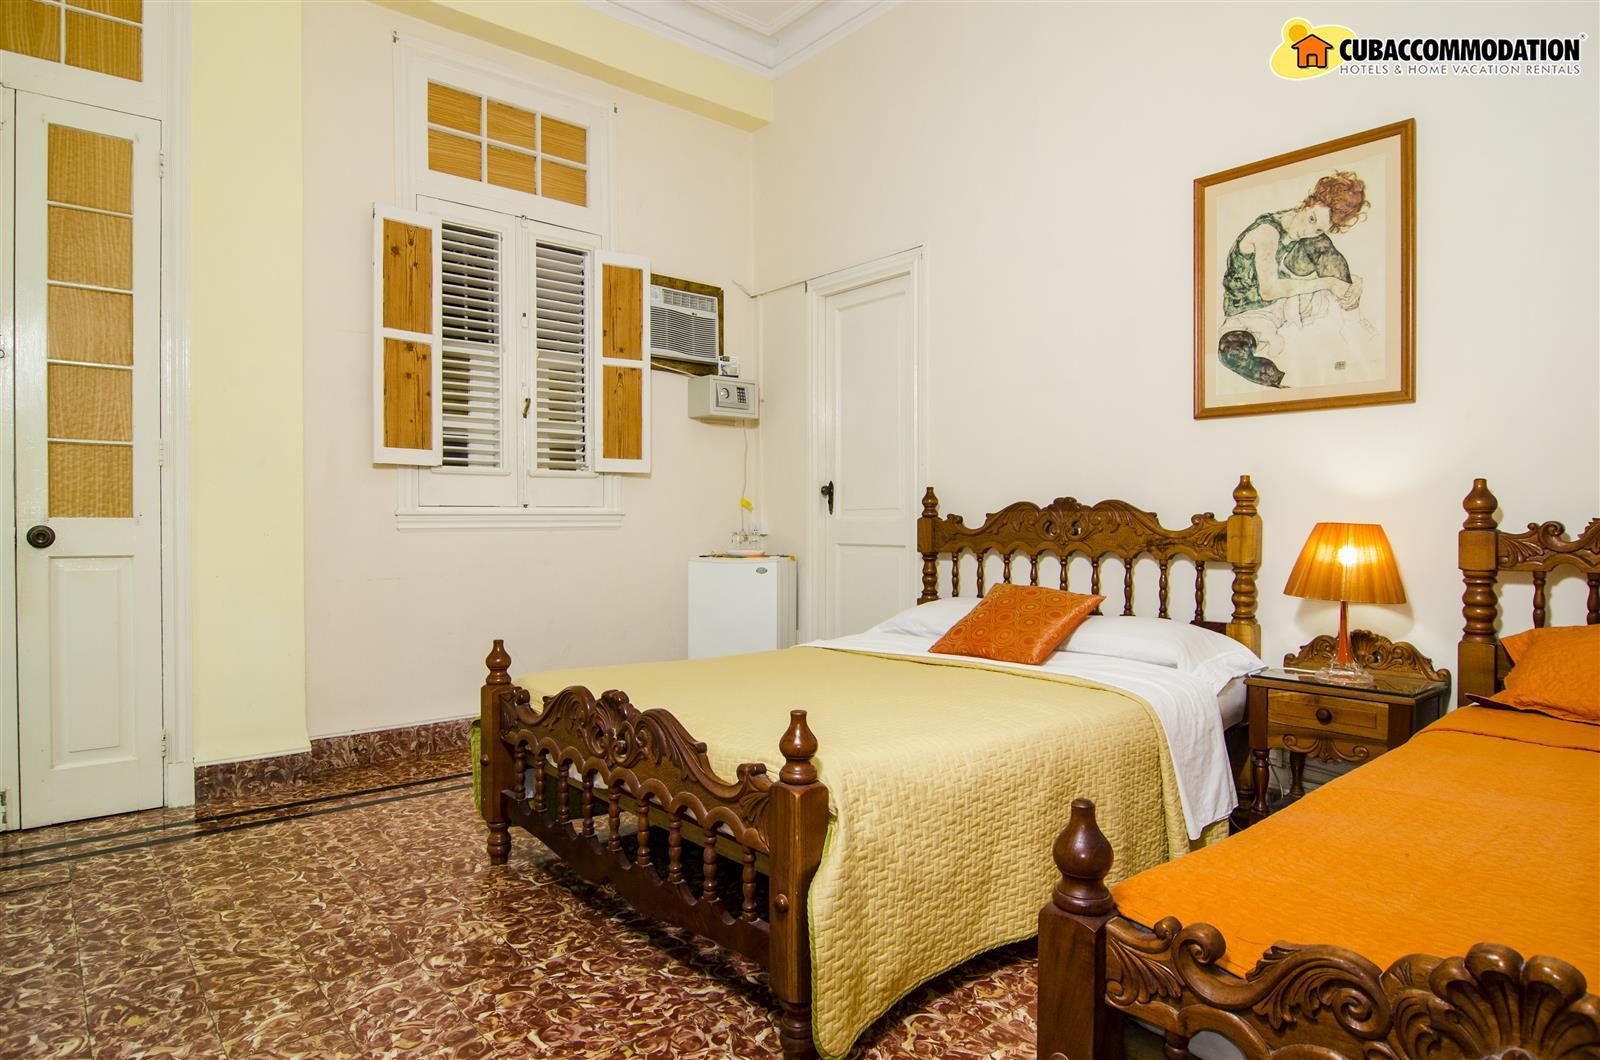 Guesthouses, Casa Mandy - Centro Habana, Home vacation ...